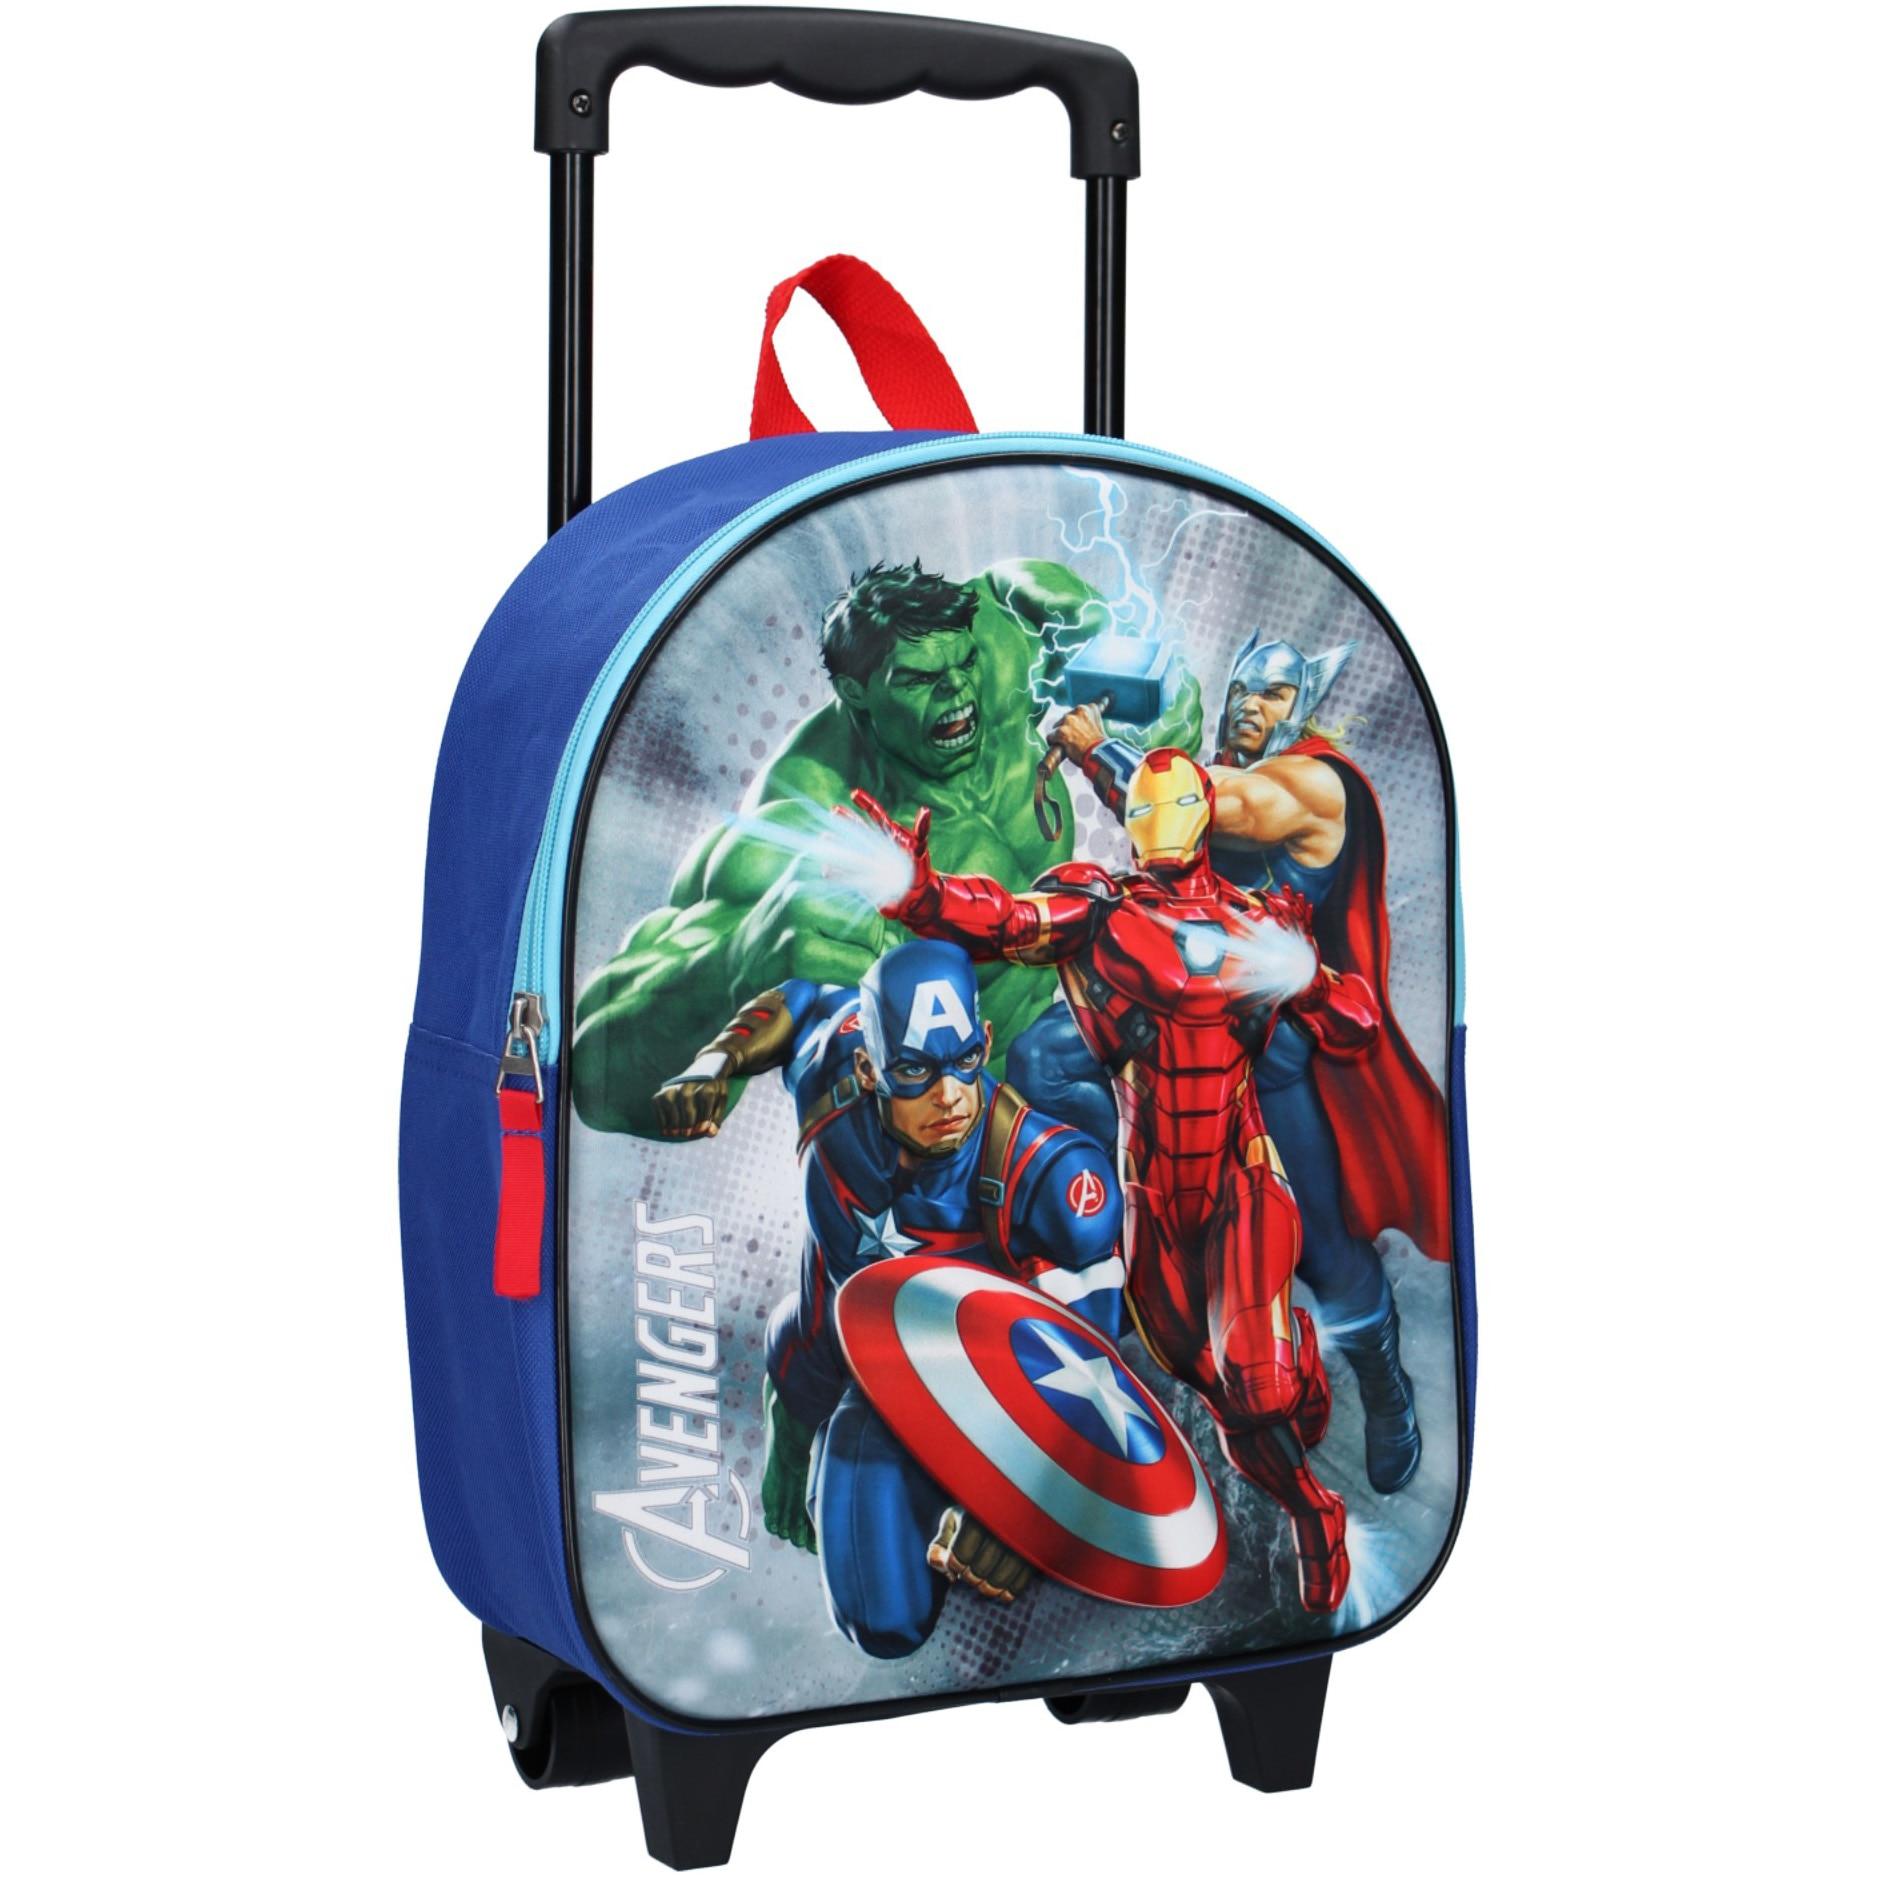 Fotografie Ghiozdan Troller Avengers Save The day (3D), 12 x 25 x 31 cm